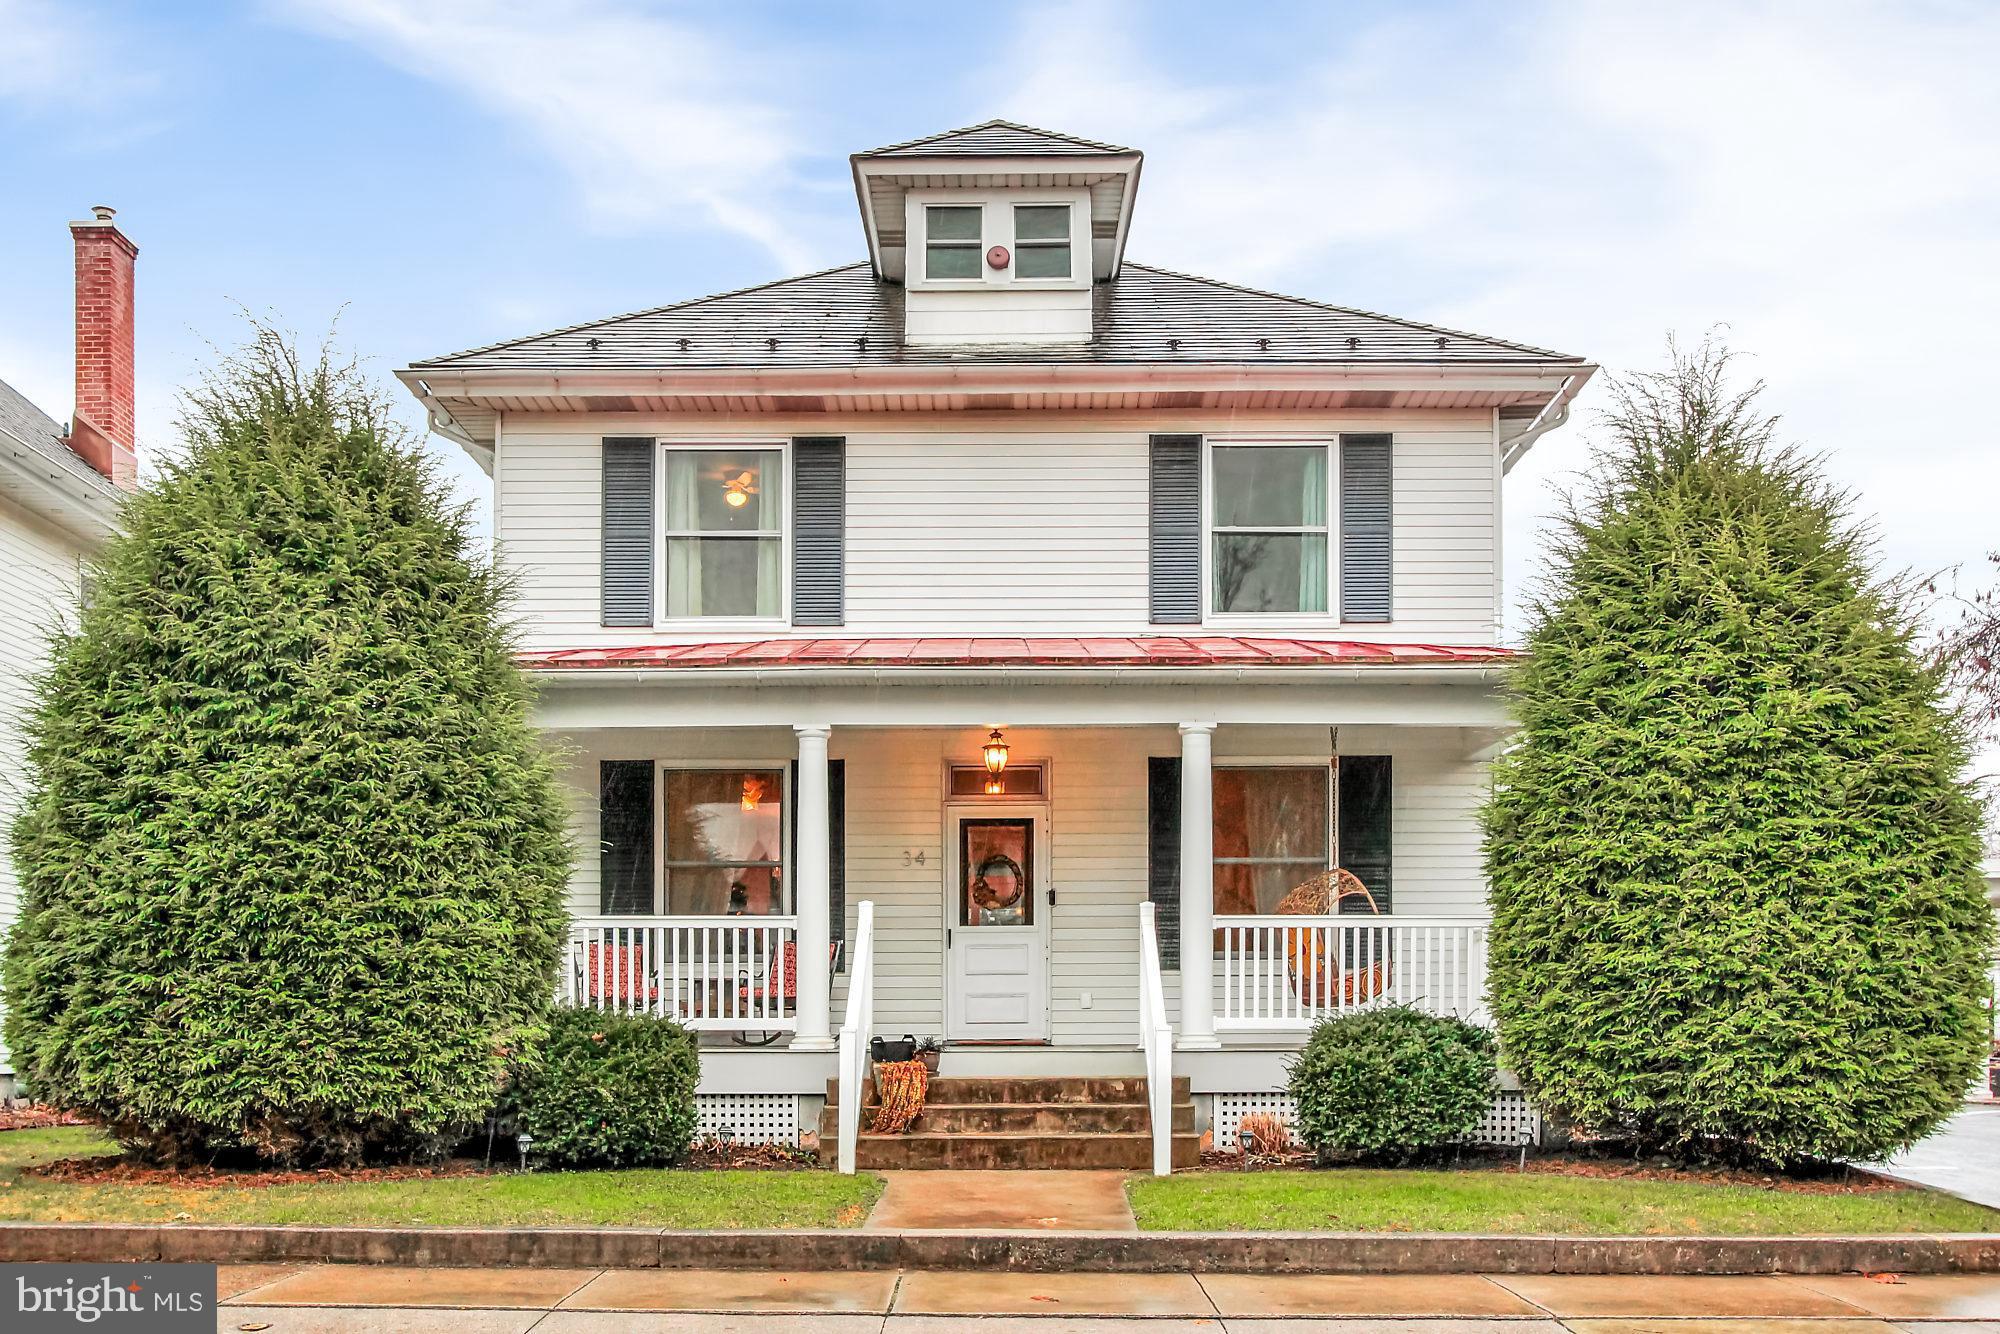 34 W GRANADA AVENUE, HERSHEY, PA 17033